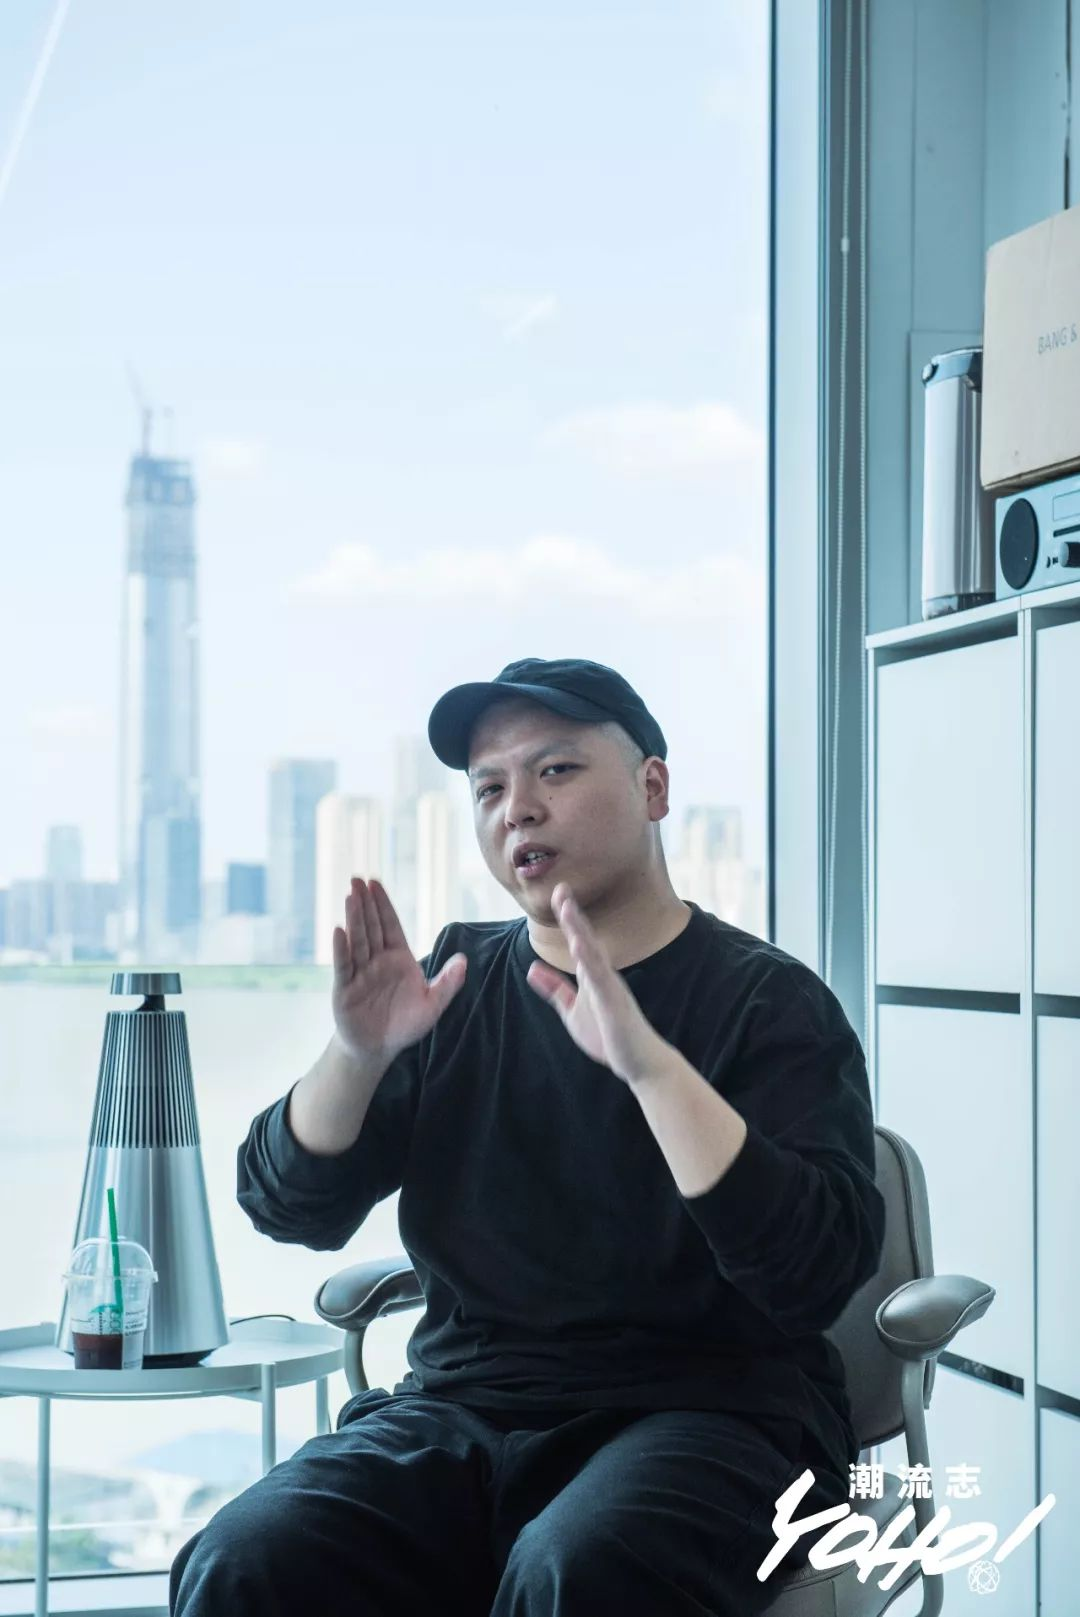 ATTEMPT 主理人梁栋:什么事情都冲着钱去,真的不酷。